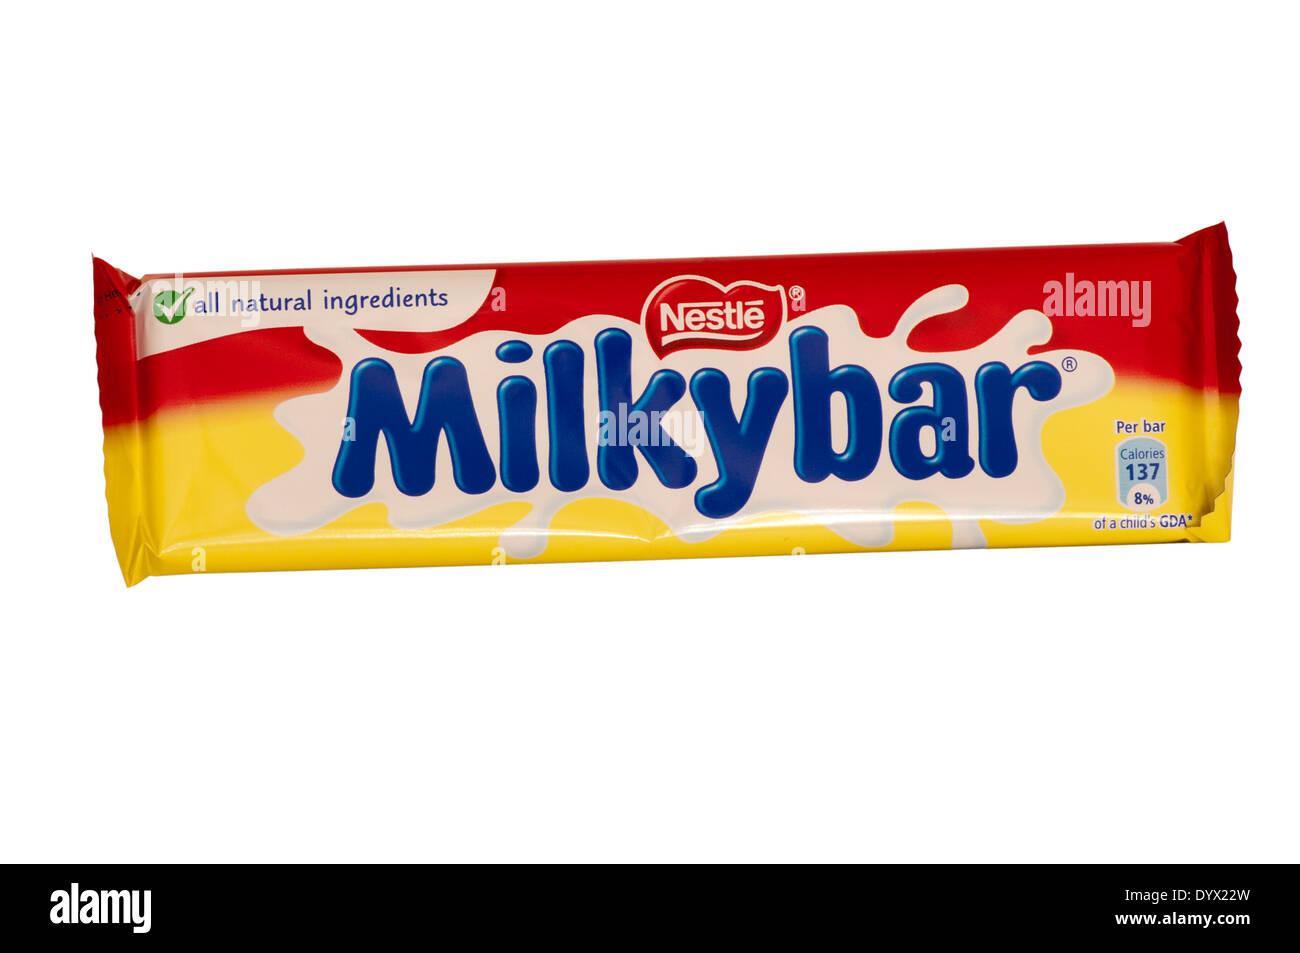 Nestle Milky Bar Chocolate Stock Photo, Royalty Free Image ...